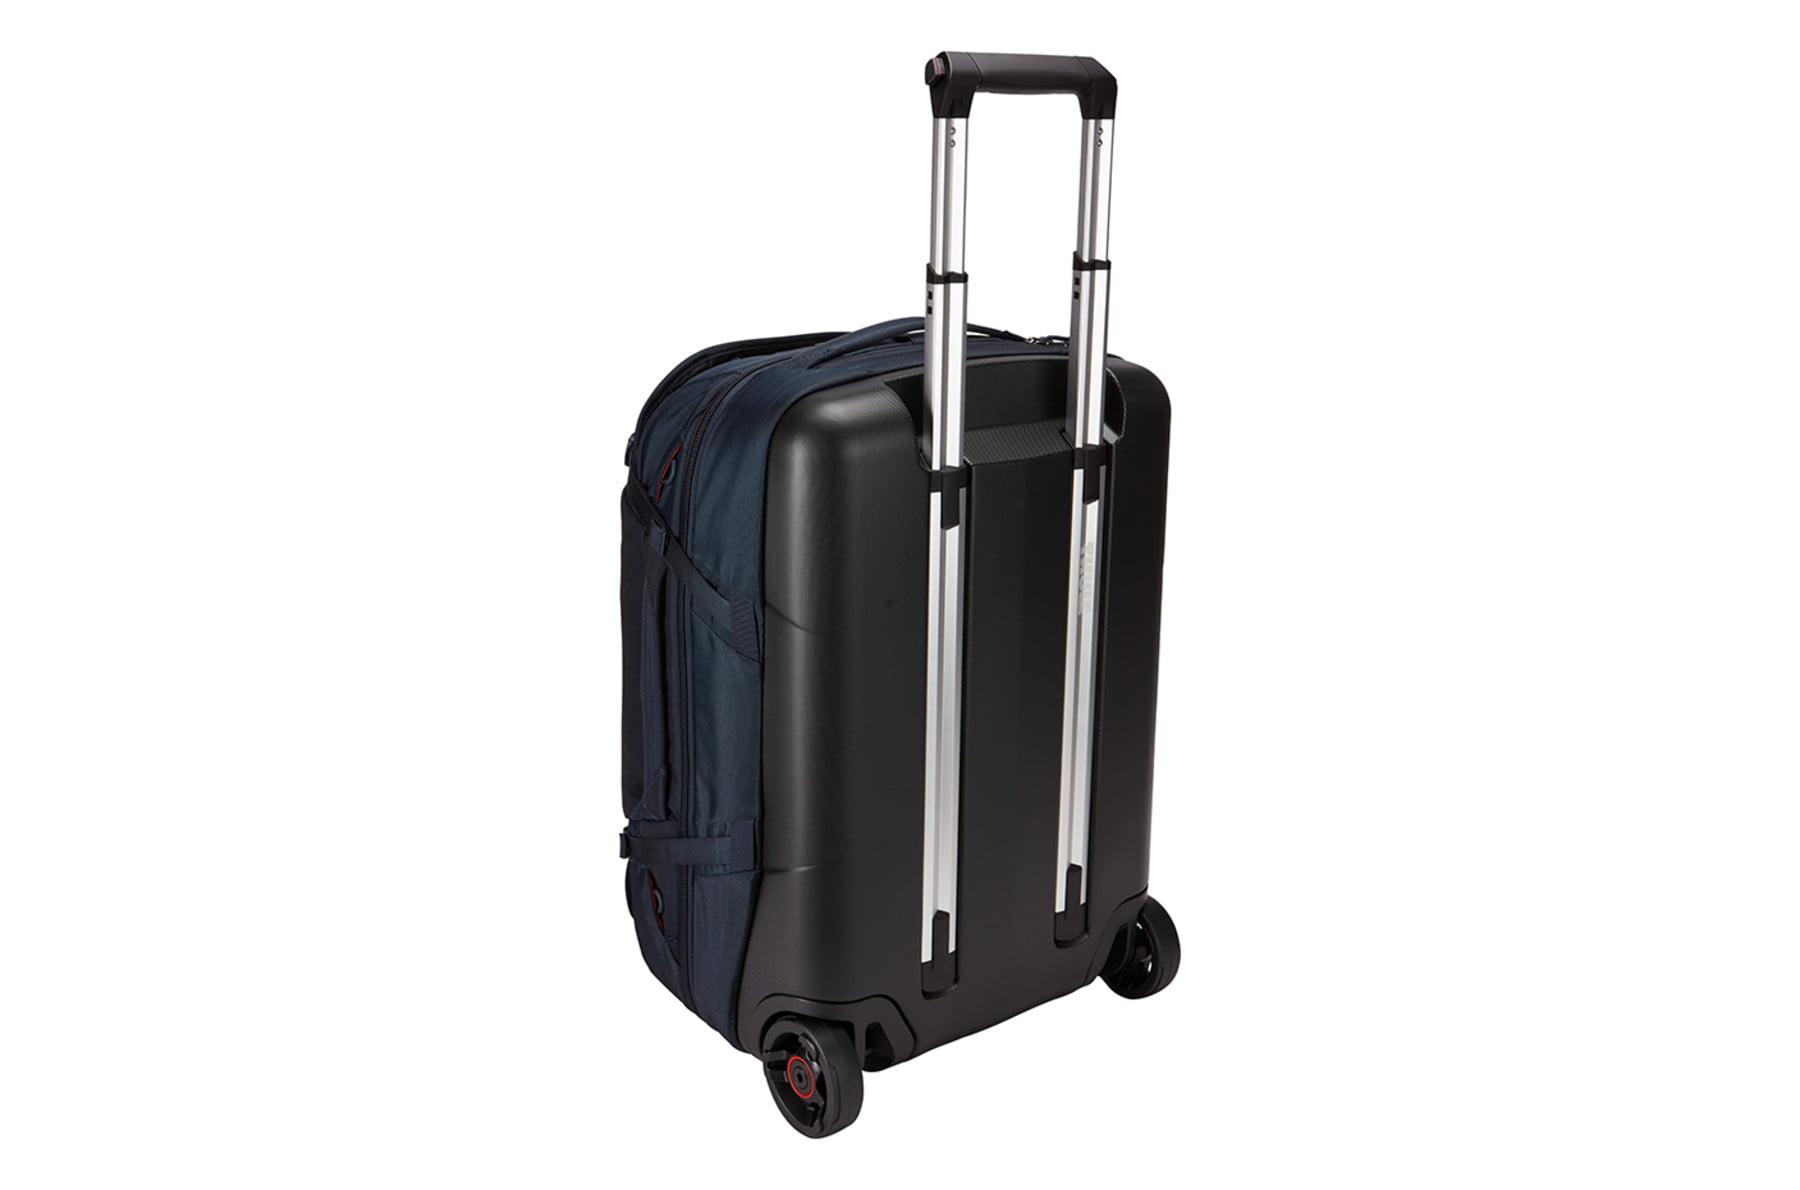 Geanta voiaj Thule Subterra Luggage 55cm22 Mineral 2